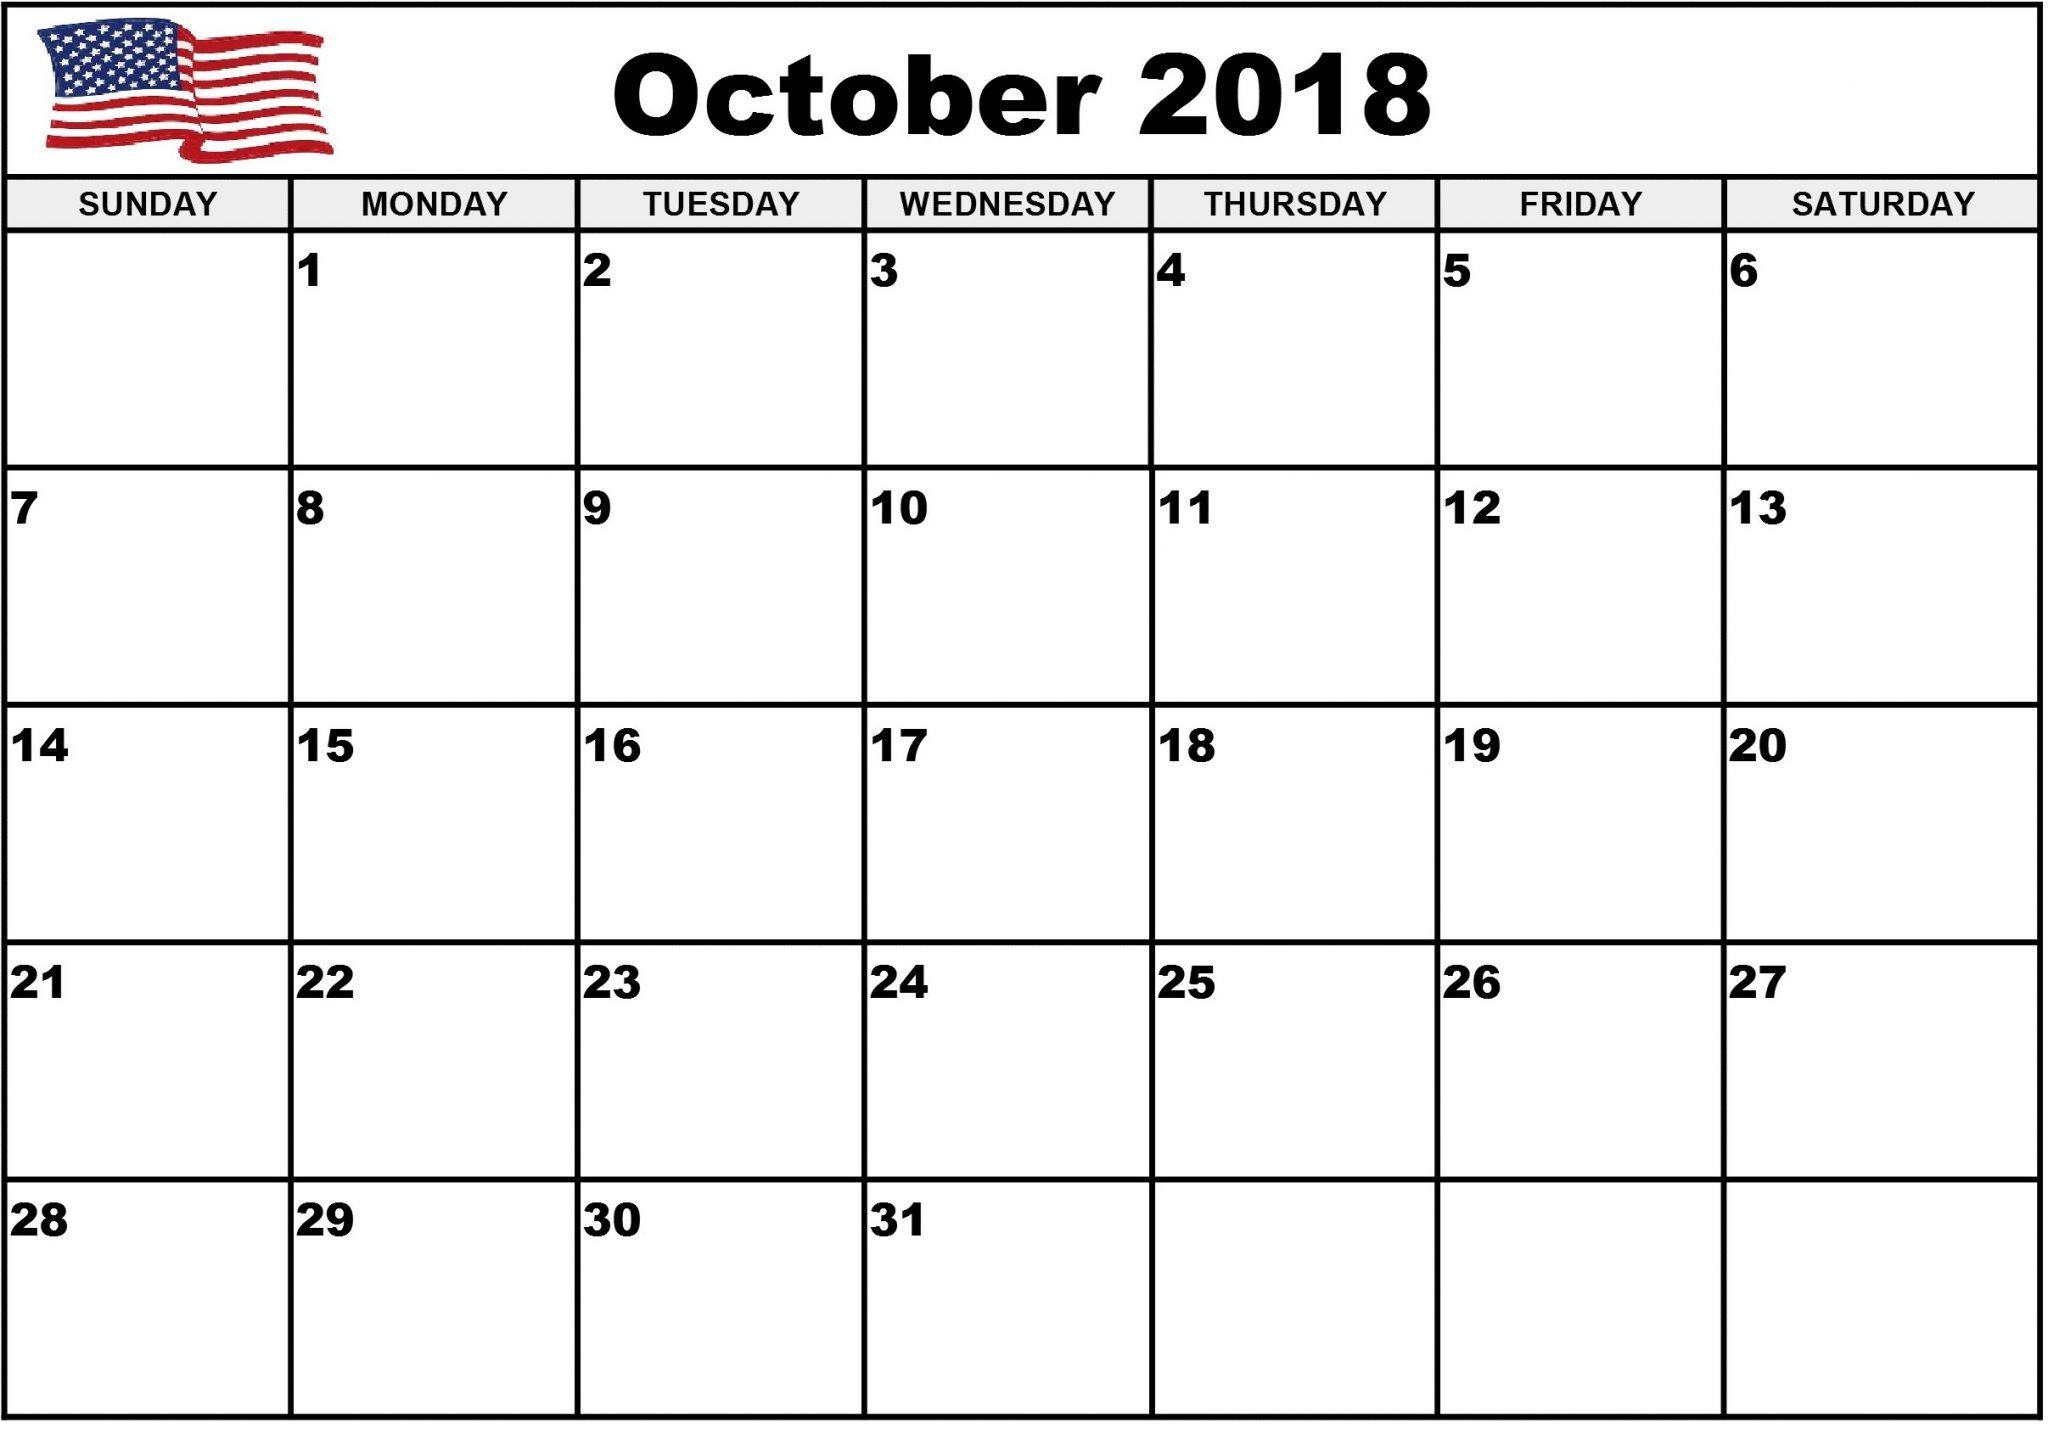 October 2018 Calendar USA